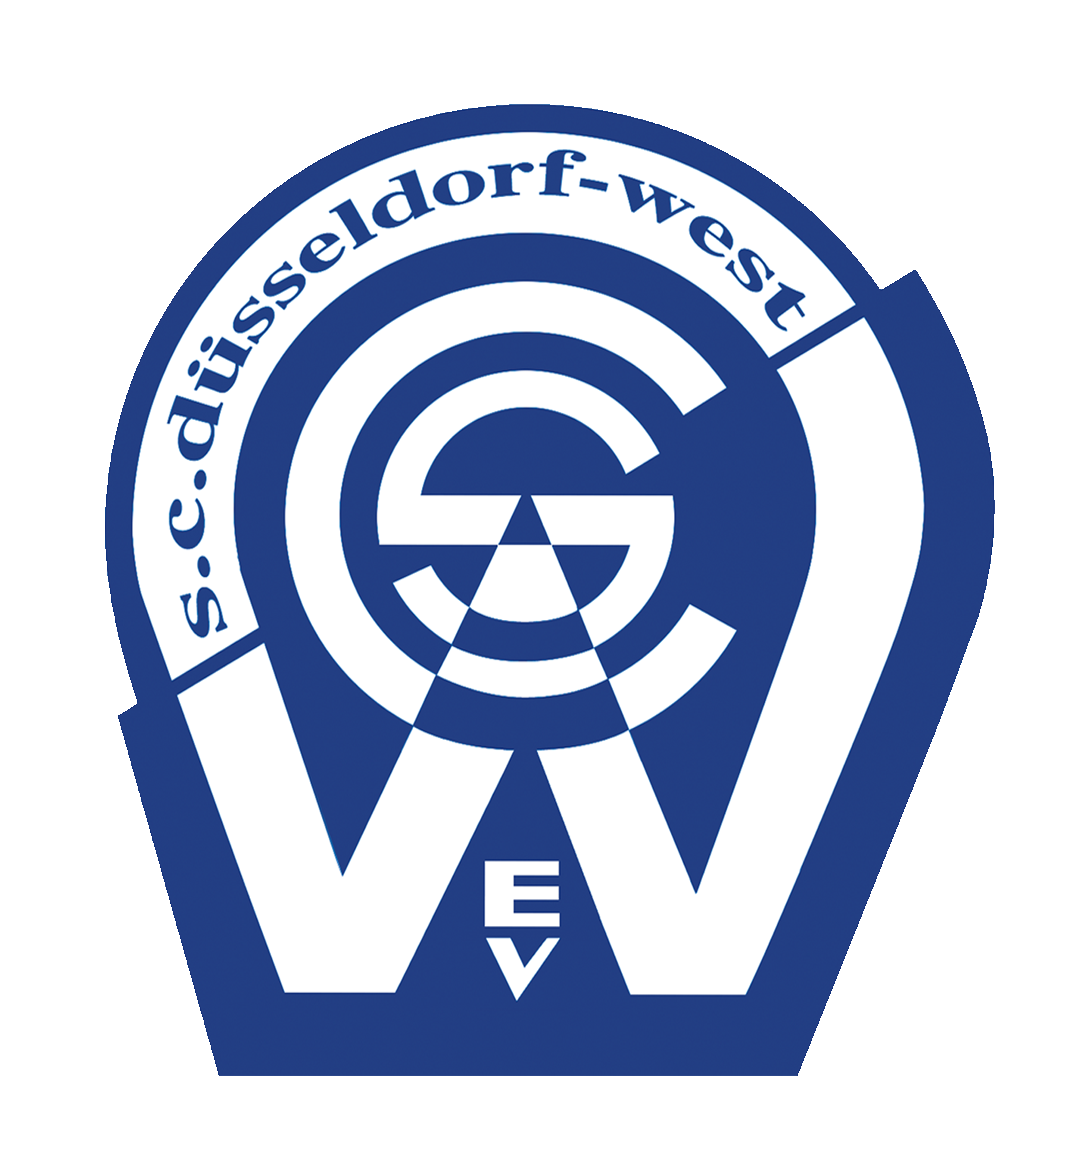 SC Düsseldorf-West 1919/50 e.V.